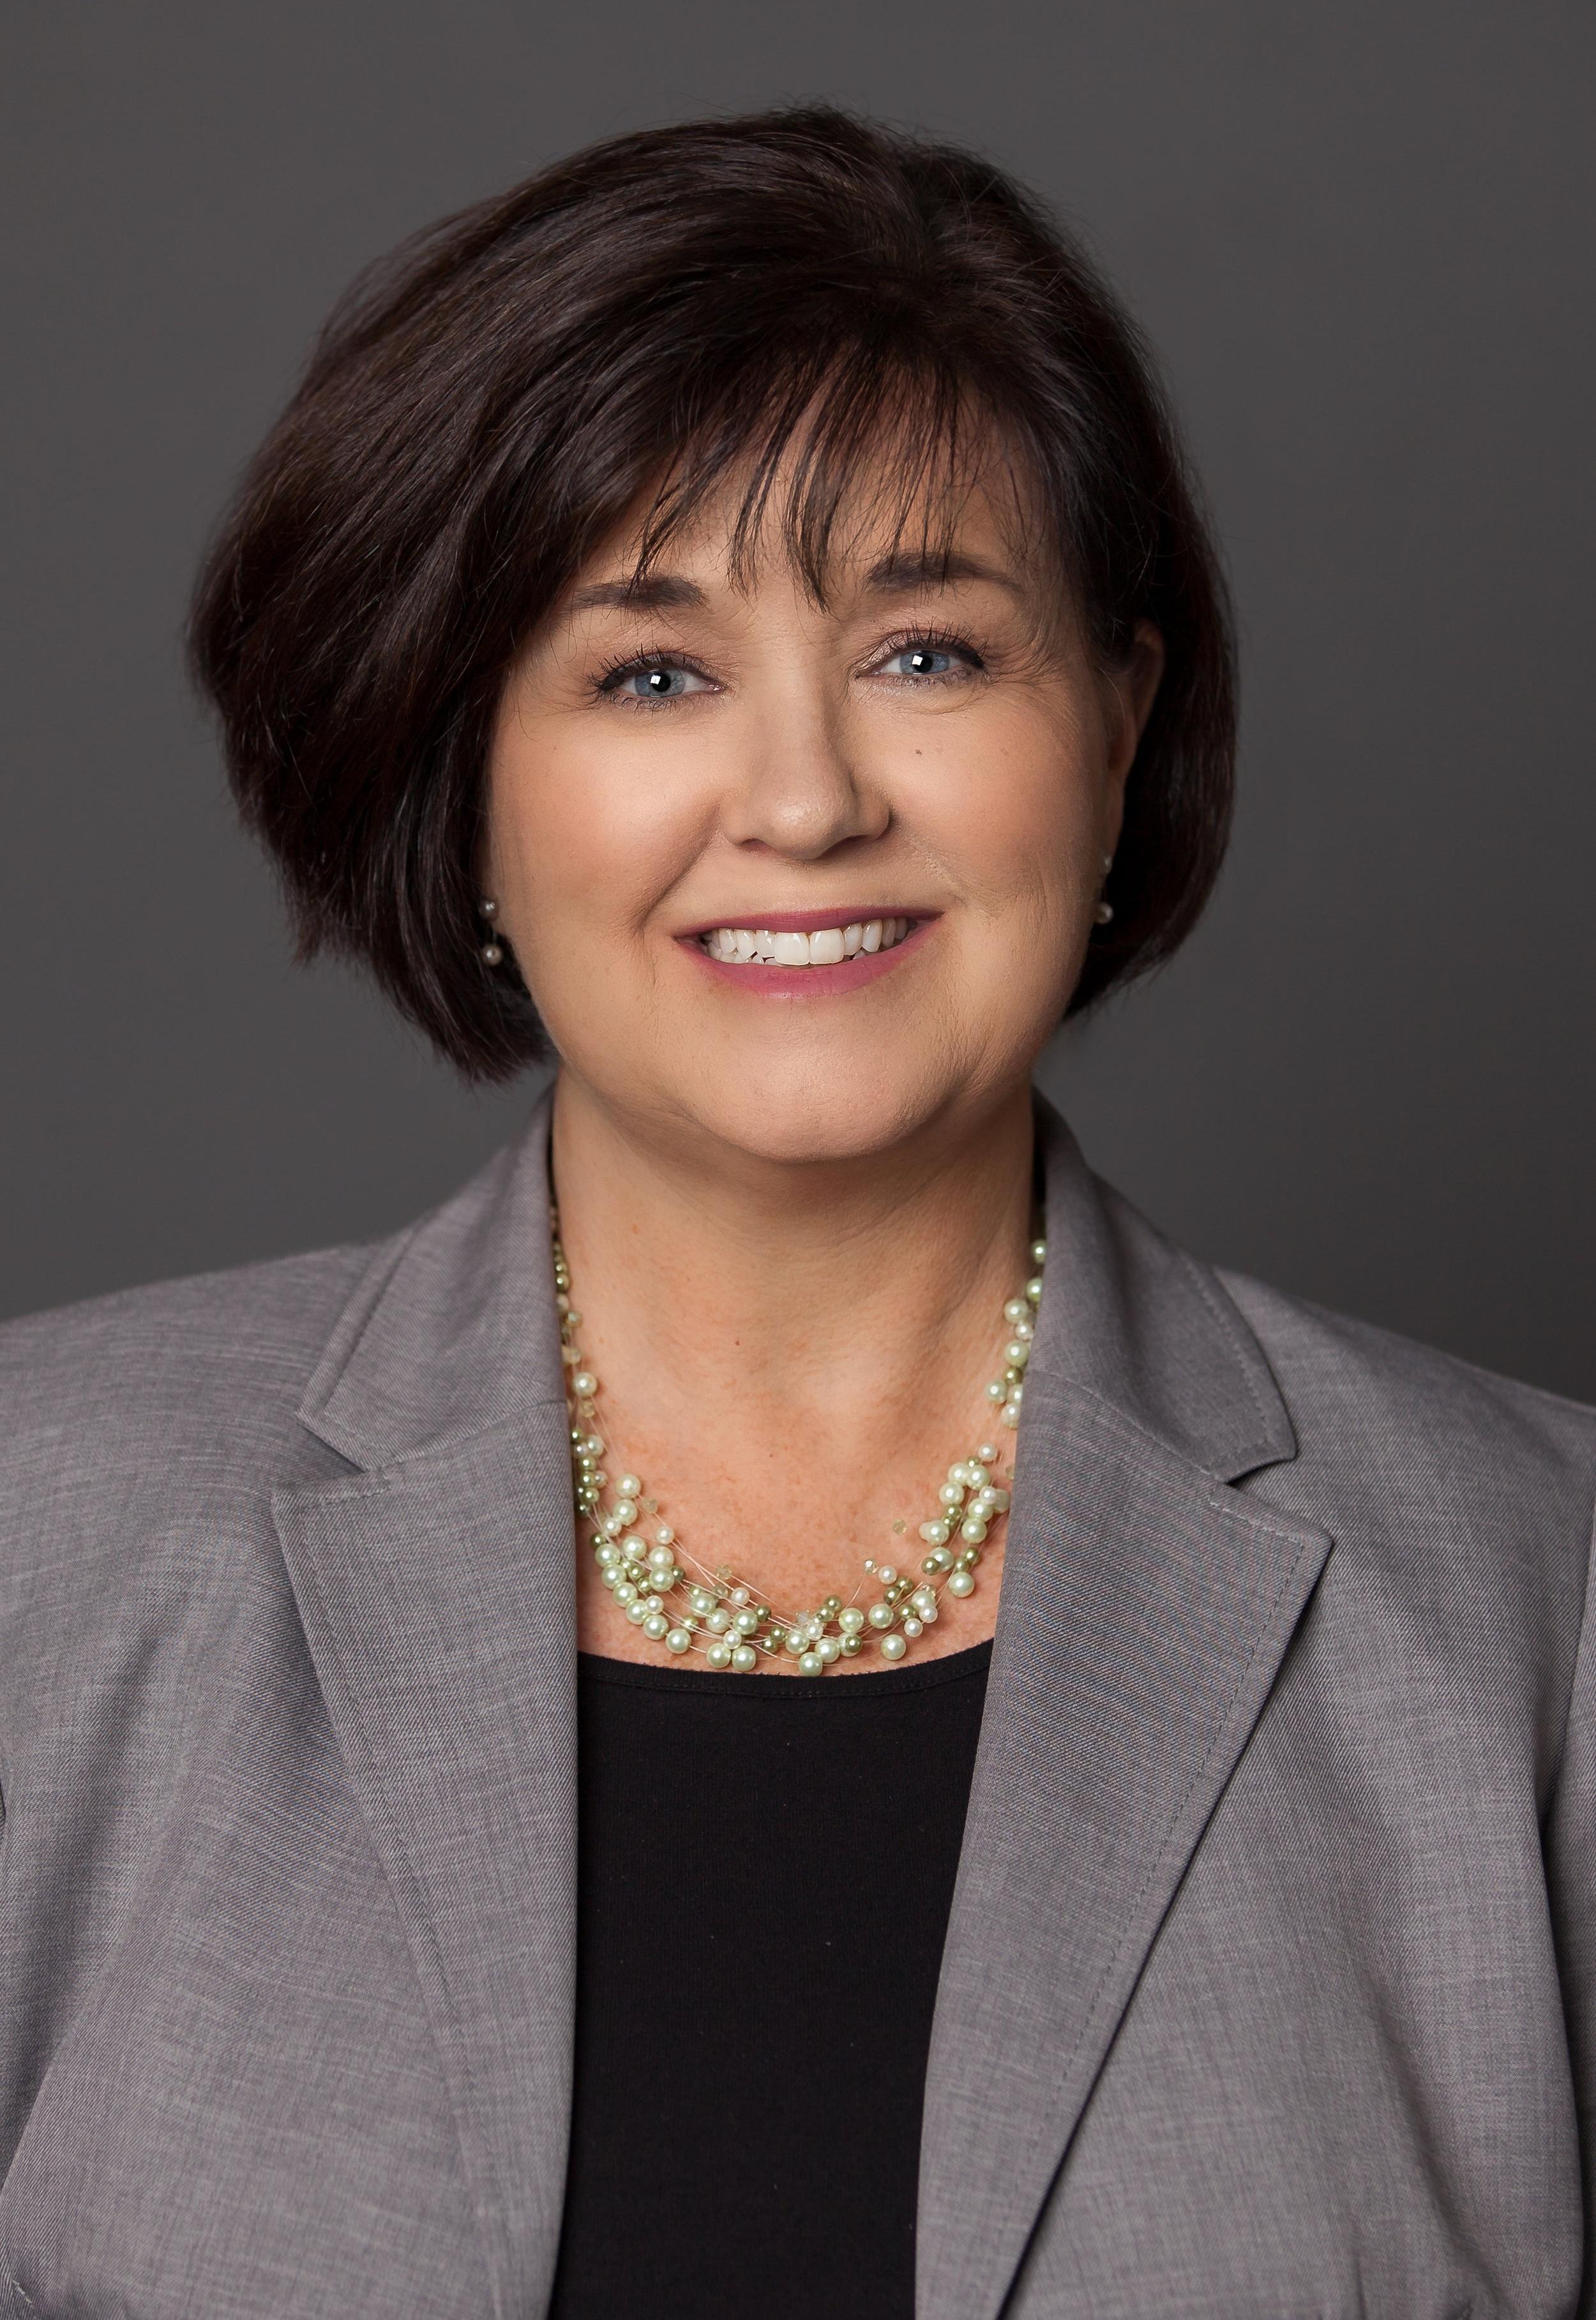 Kelly Hallenbeck     Director of Housing Grants & Programs    585-546-3700 x 3016   khallenbeck@pathstone.org